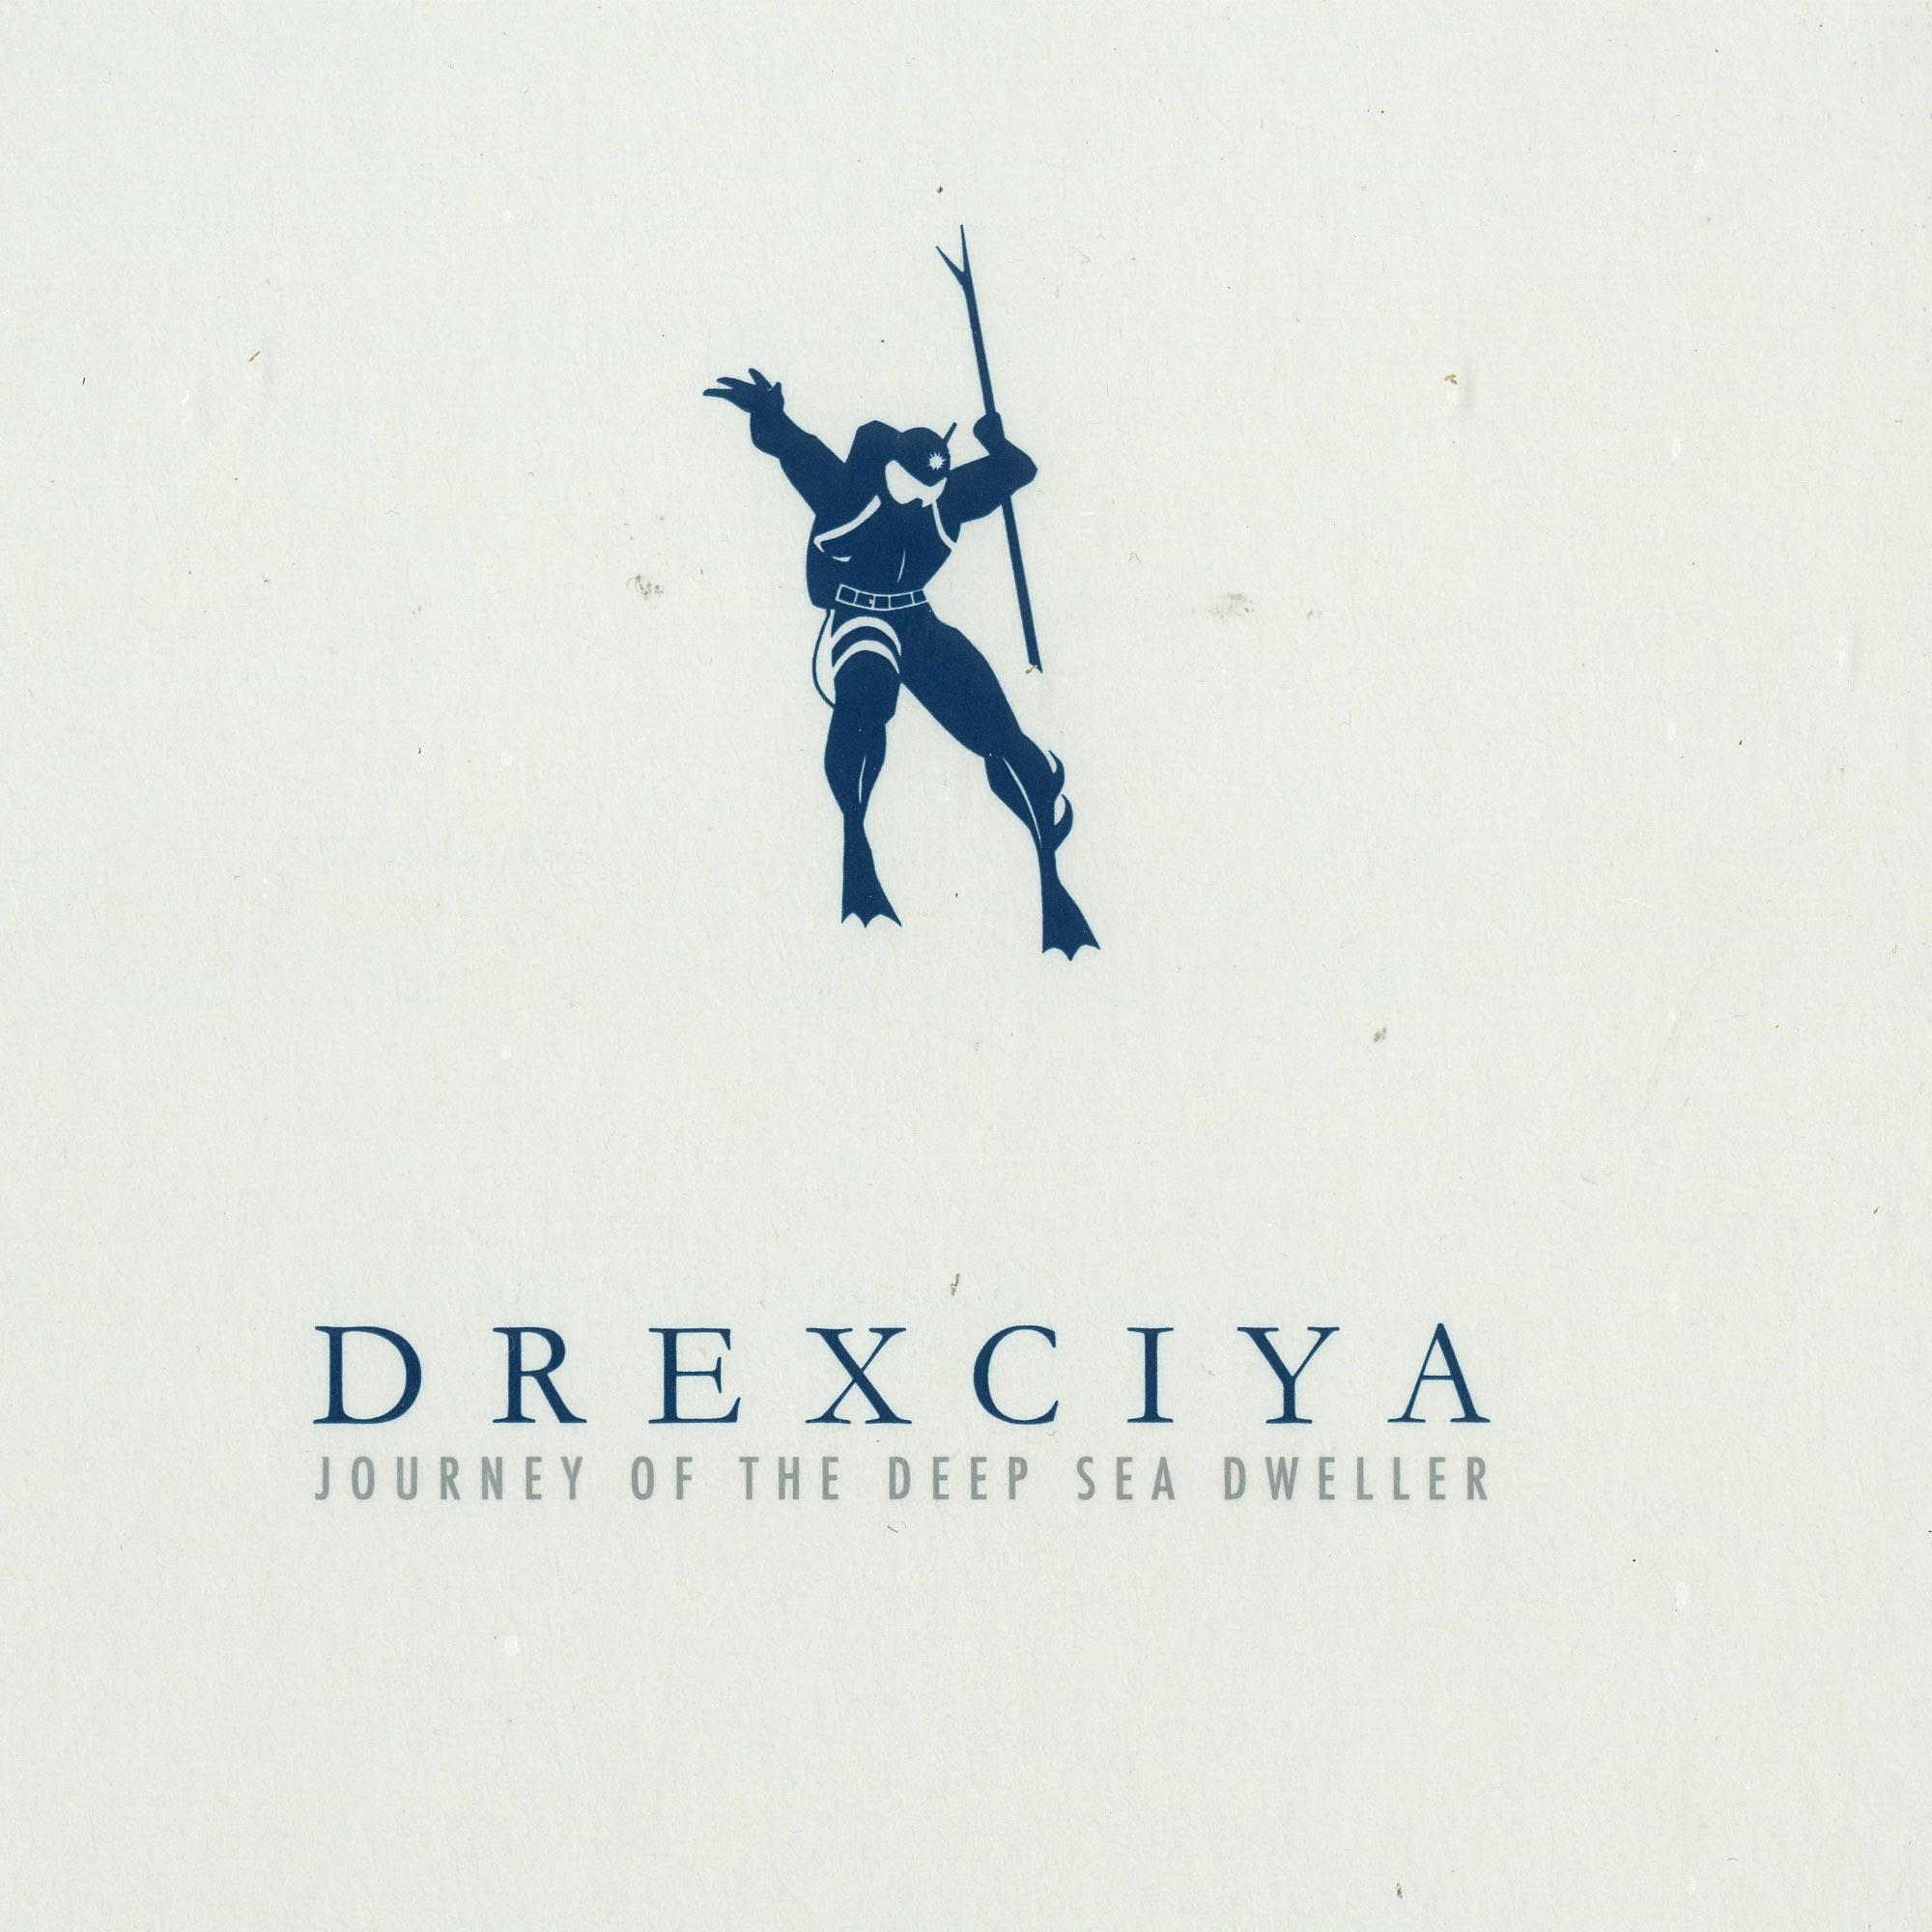 Drexciya - JOURNEY OF THE DEEP SEA DWELLER 4